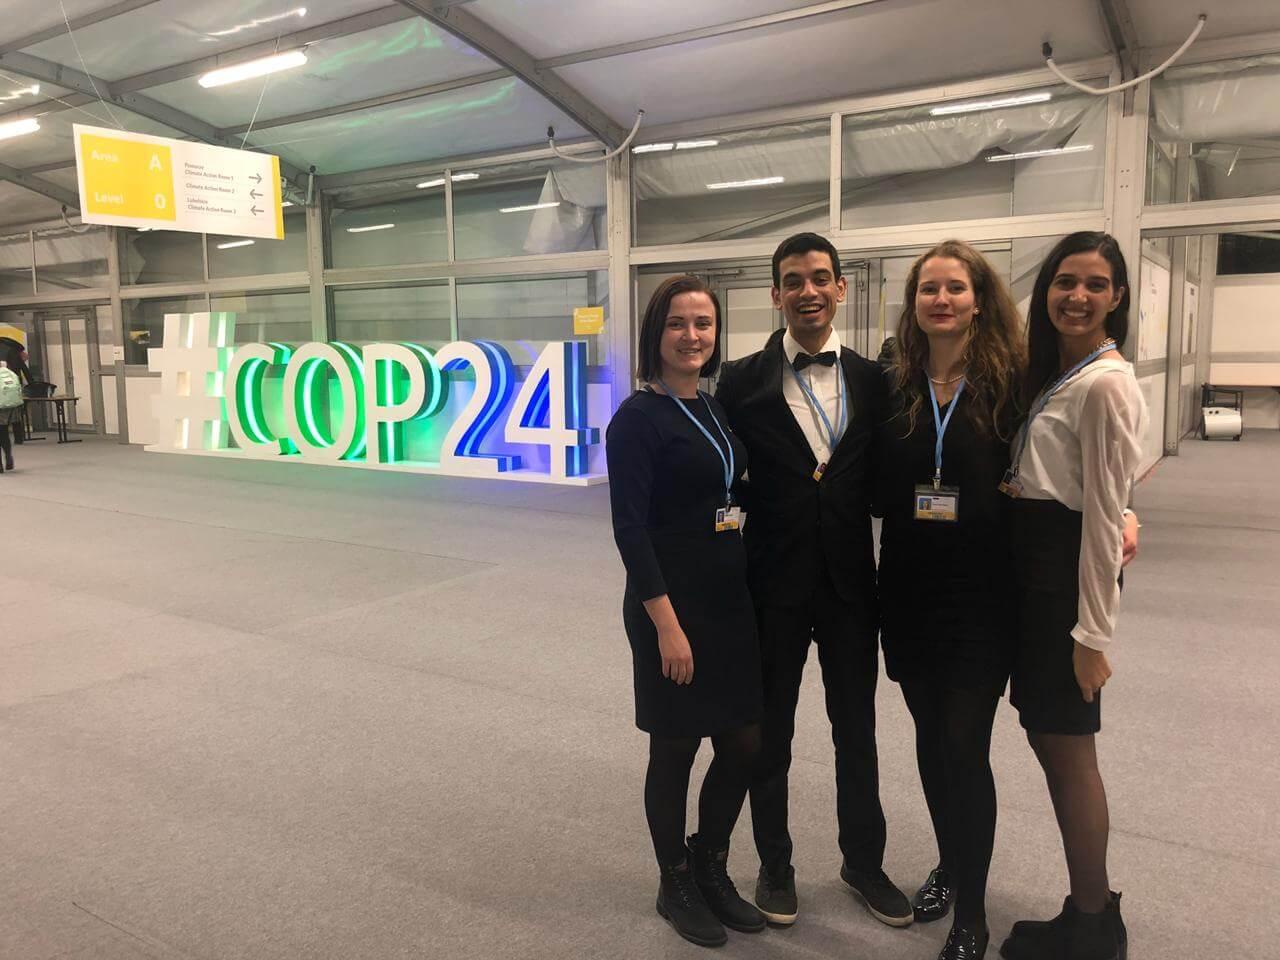 UNFCCC COP24 at Katowice